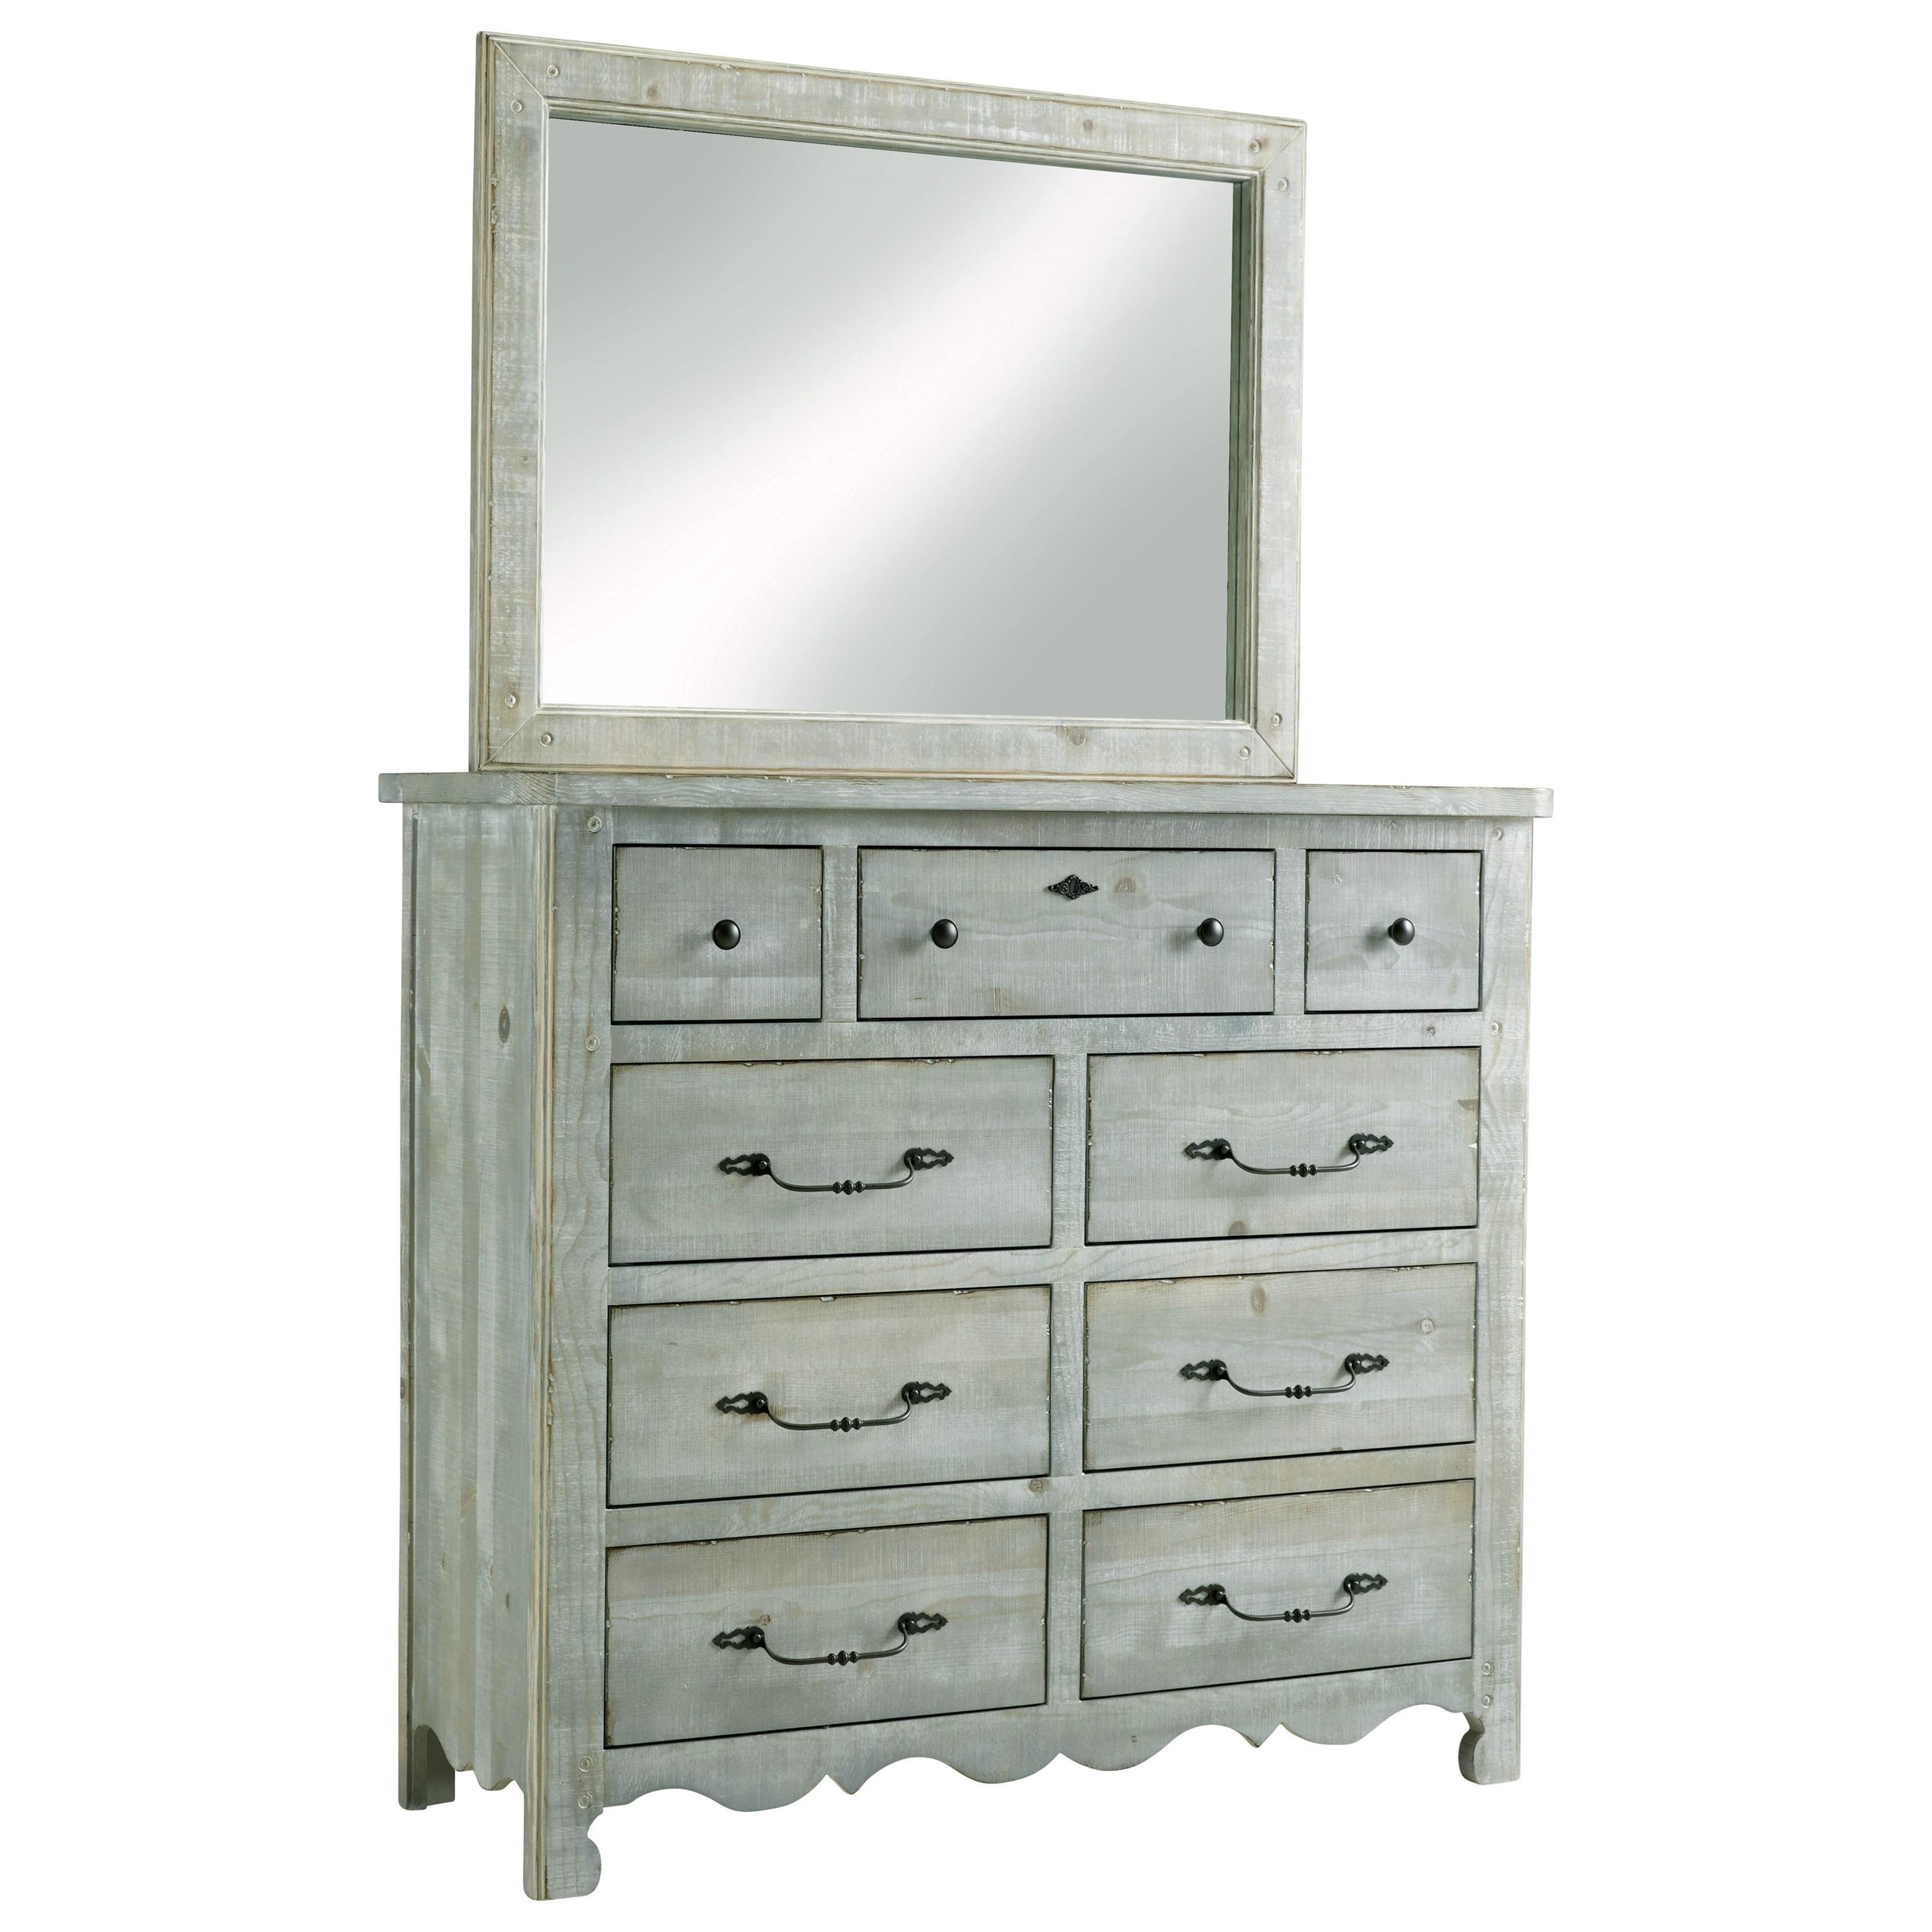 Chatsworth Drawer Dresser & Mirror by Progressive Furniture at Value City Furniture